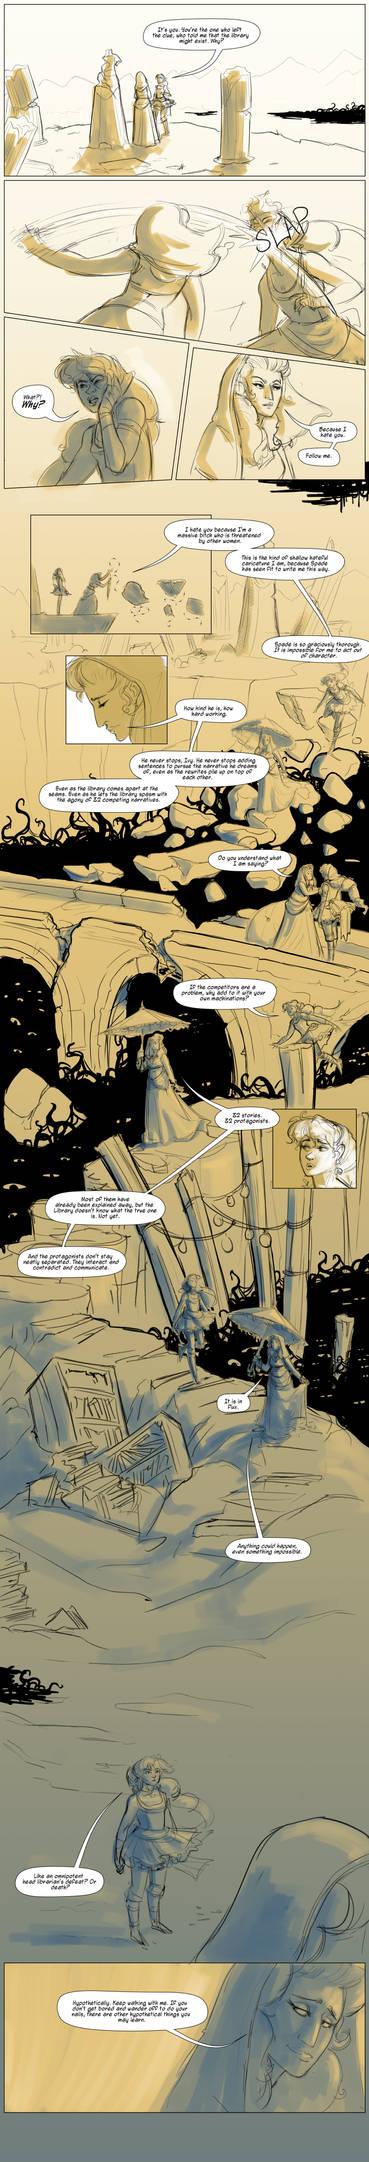 SD Round 4 Page 2